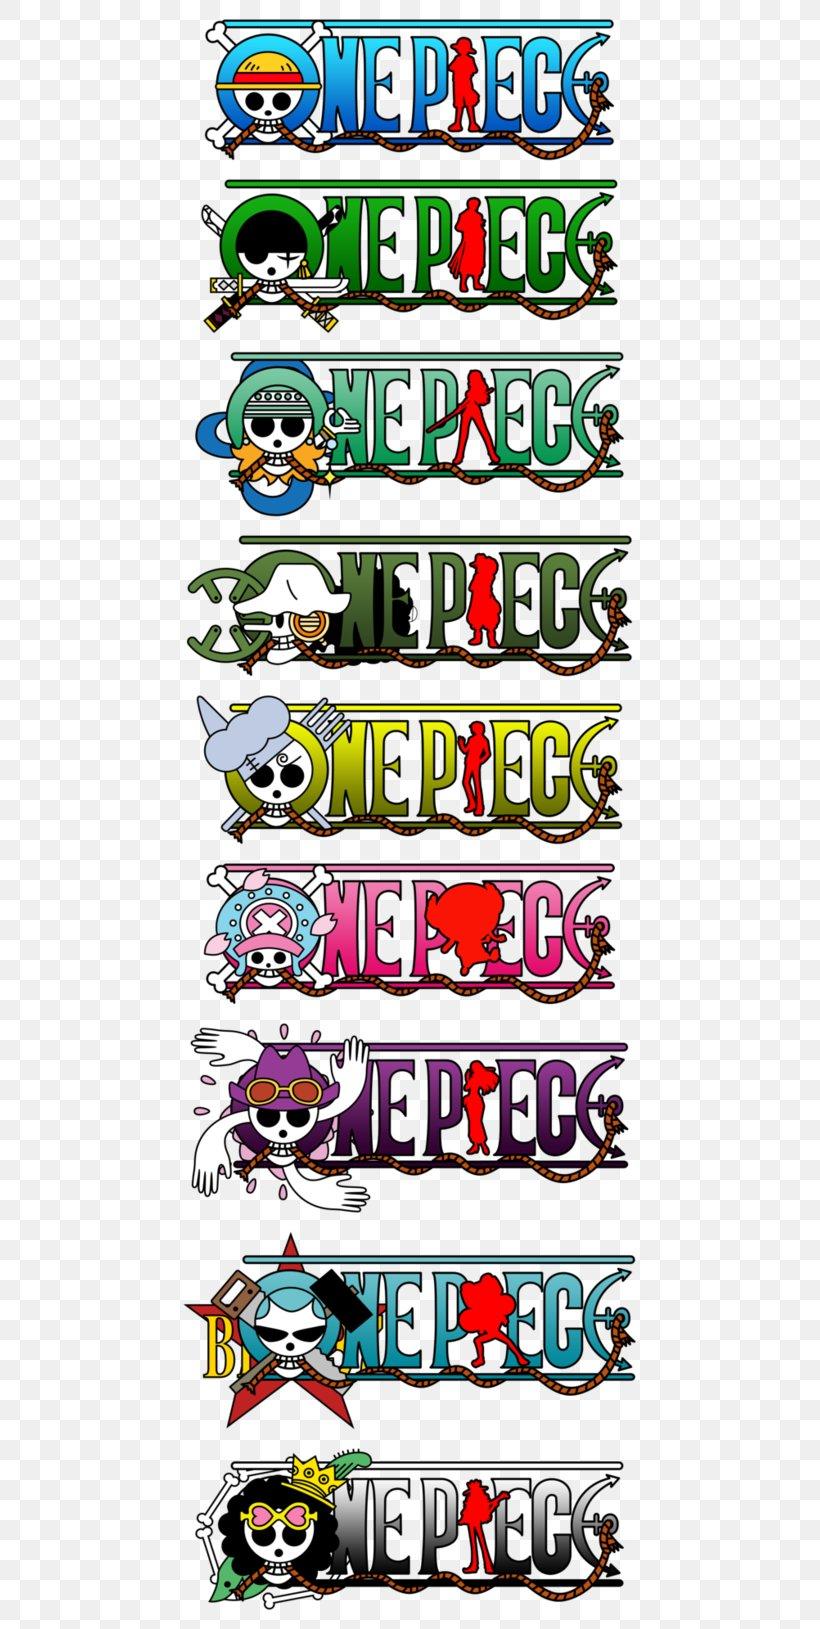 Monkey D. Luffy Usopp Vinsmoke Sanji Roronoa Zoro Nami, PNG, 491x1629px, Monkey D Luffy, Area, Art, Jolly Roger, Logo Download Free